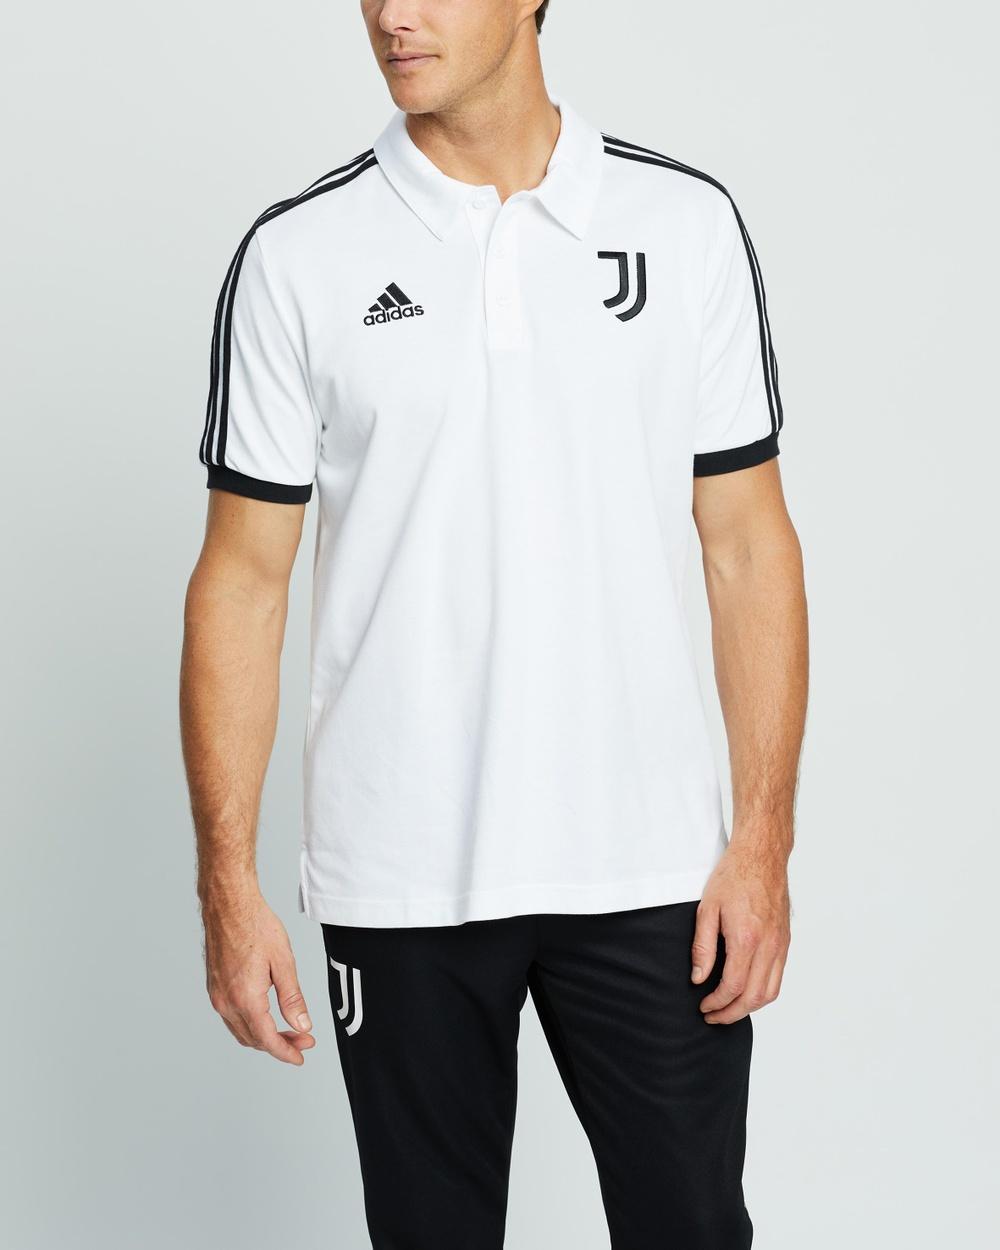 adidas Performance Juve 3 Stripes Polo Shirts & Polos White Black 3-Stripes